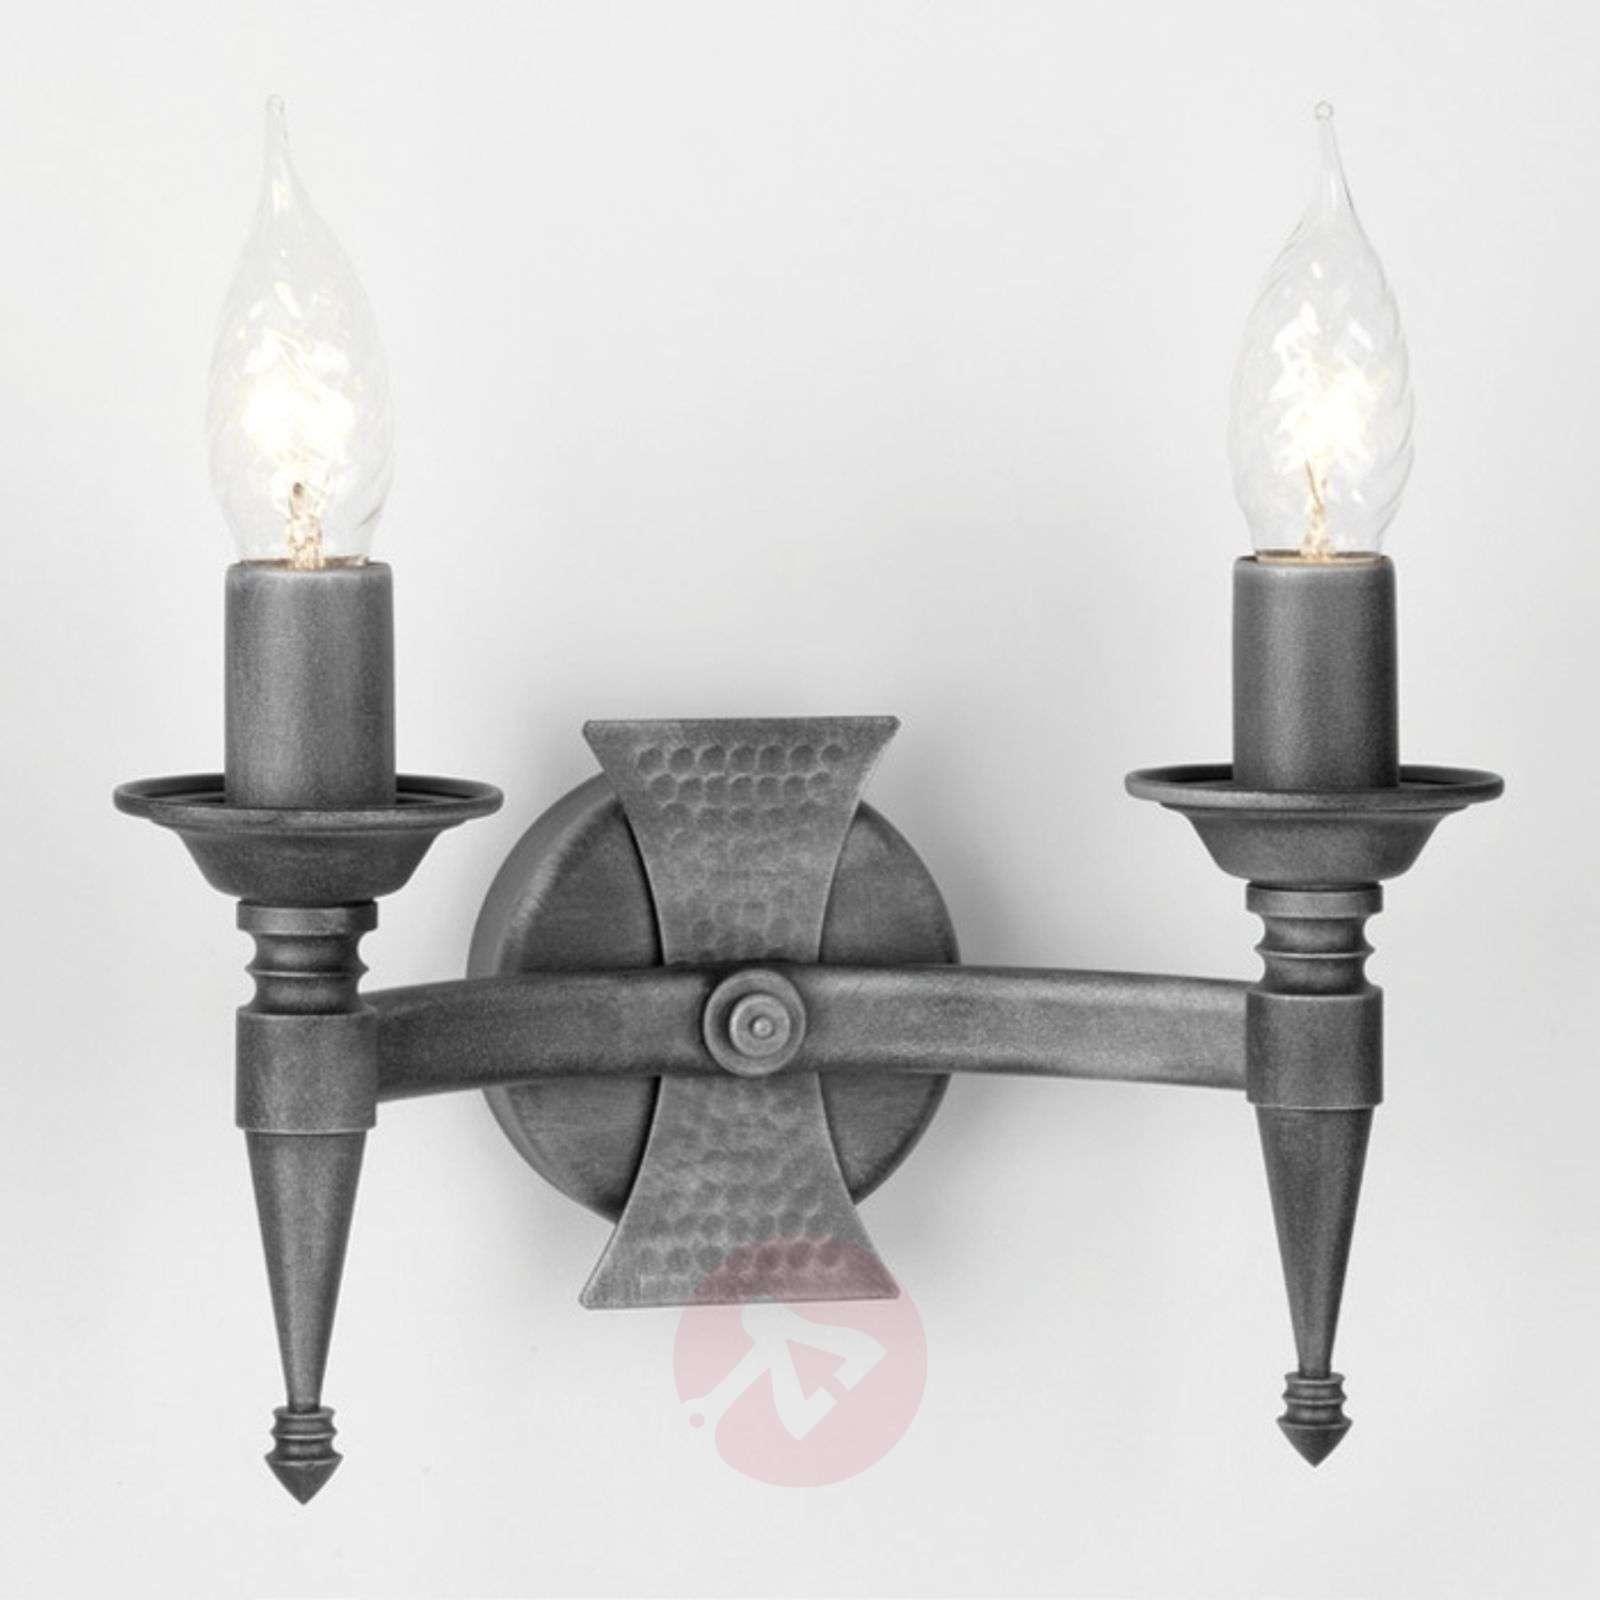 Saxon Wall Light Two Bulbs-3048047X-01